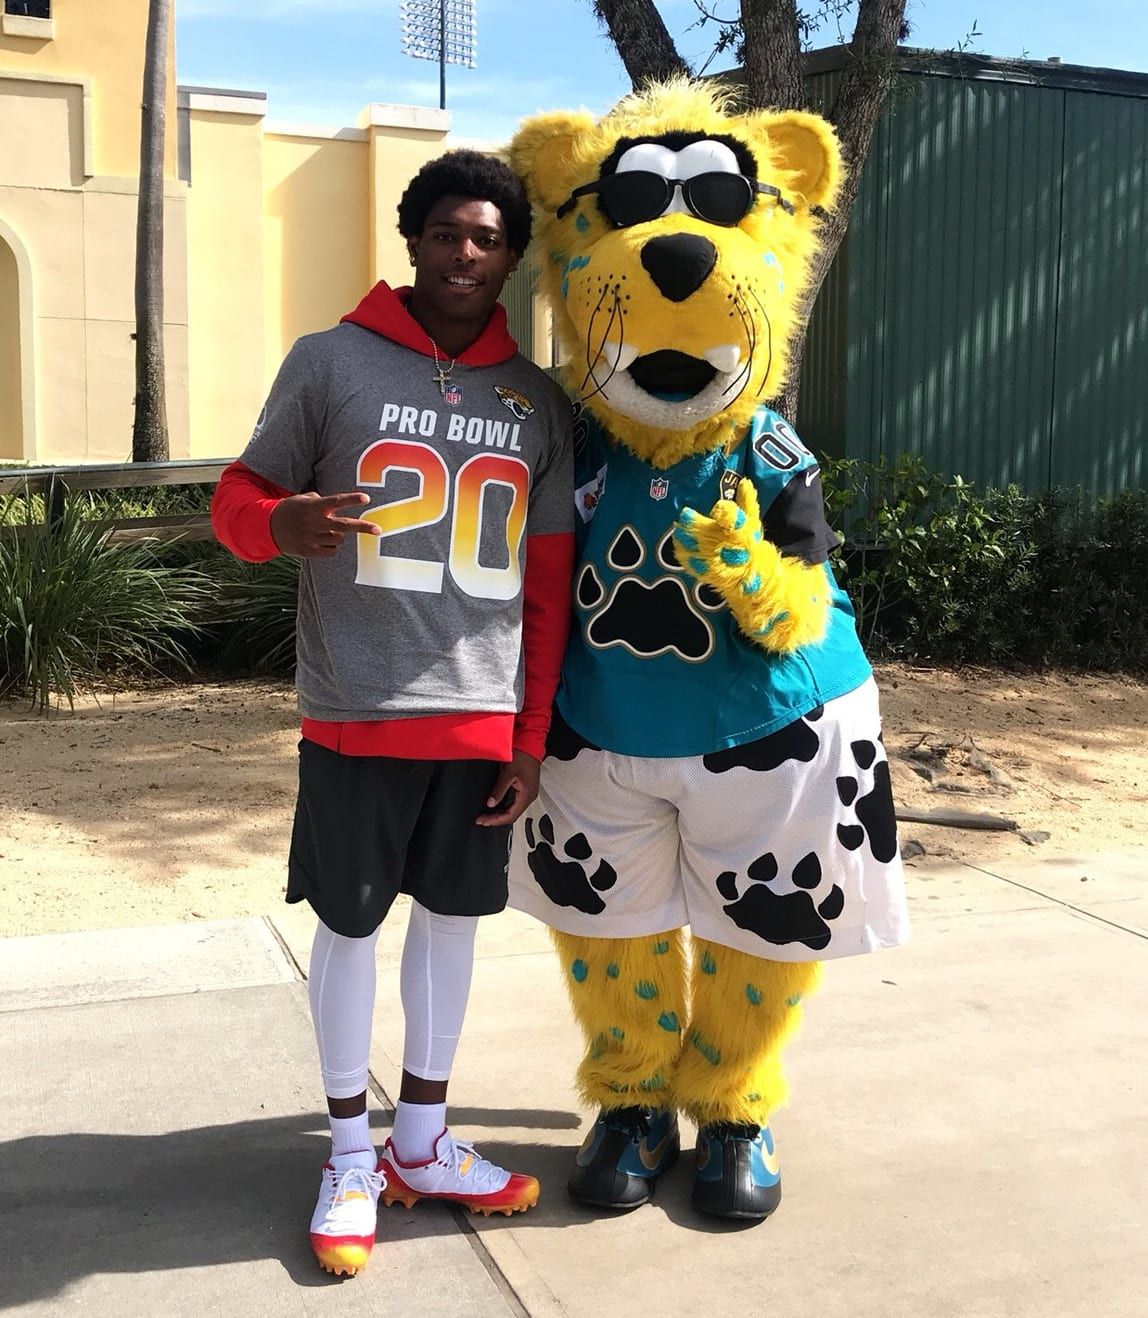 Jalen Ramsey Air Jordan 11 Low 2018 Pro Bowl PE AFC